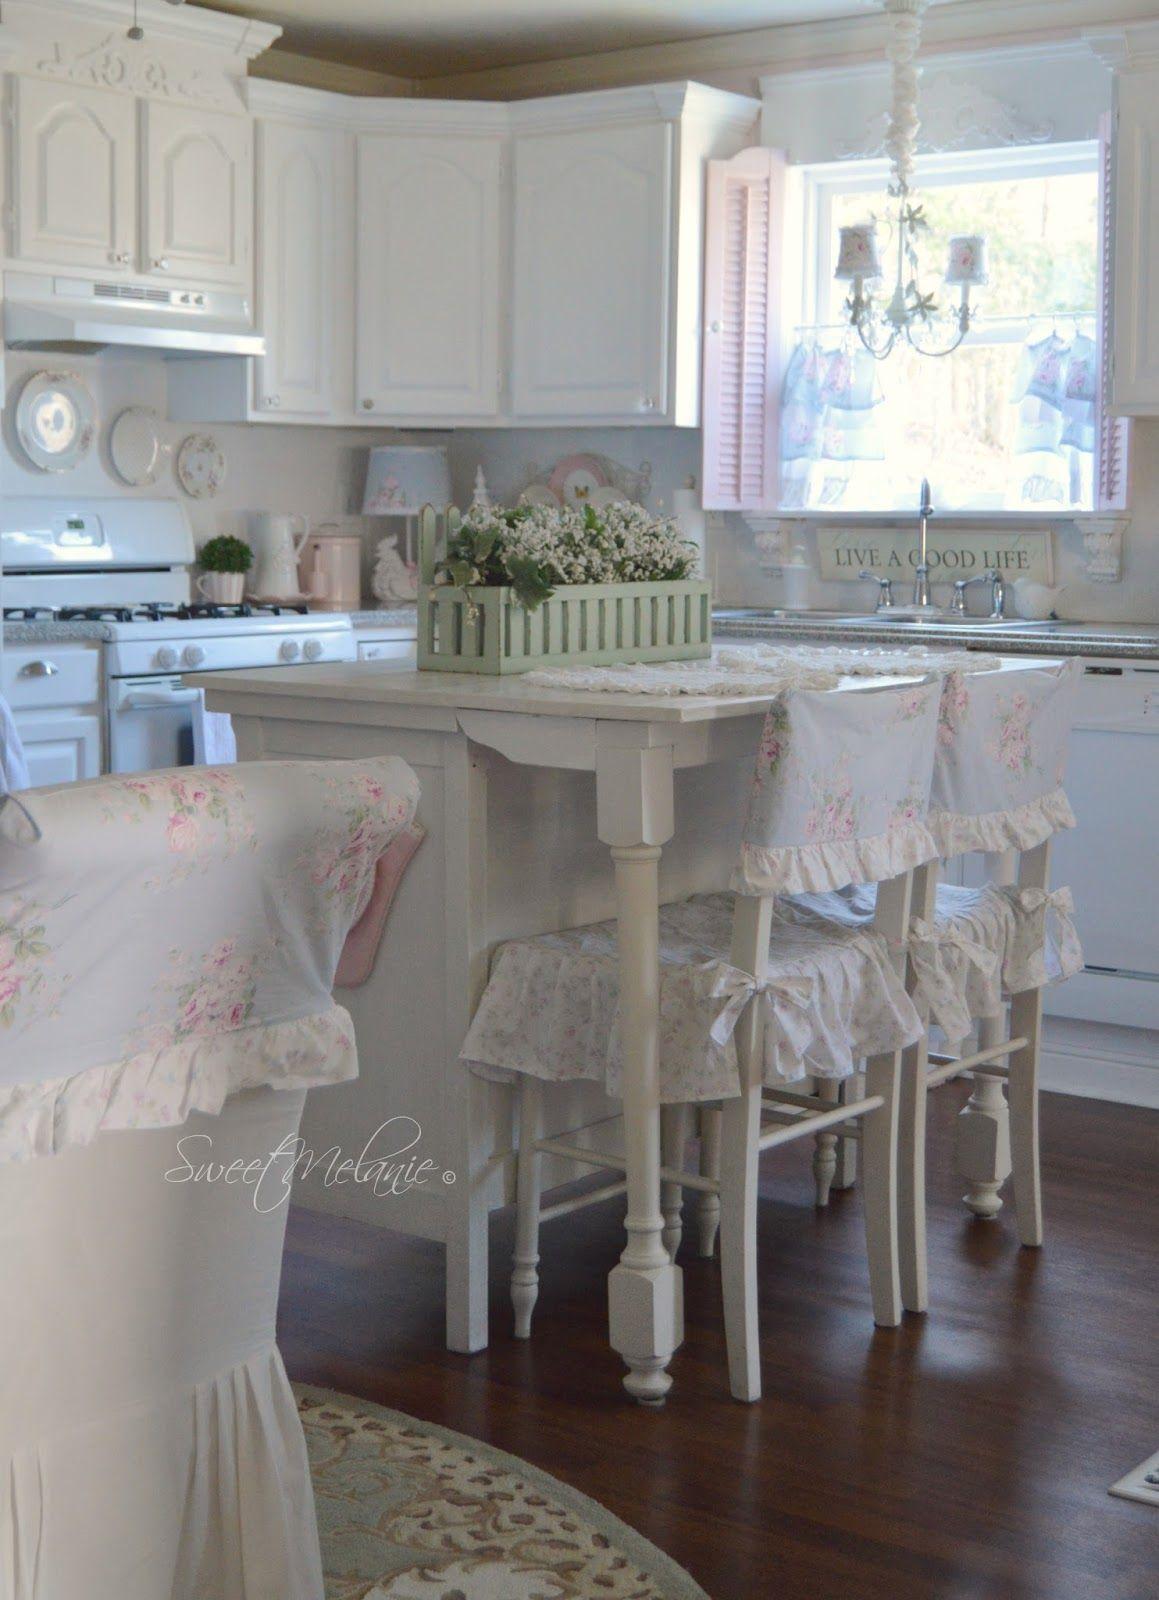 Cucina Stile Shabby Chic.Shabby And Charme Shabby Chic Style A Casa Di Melanie